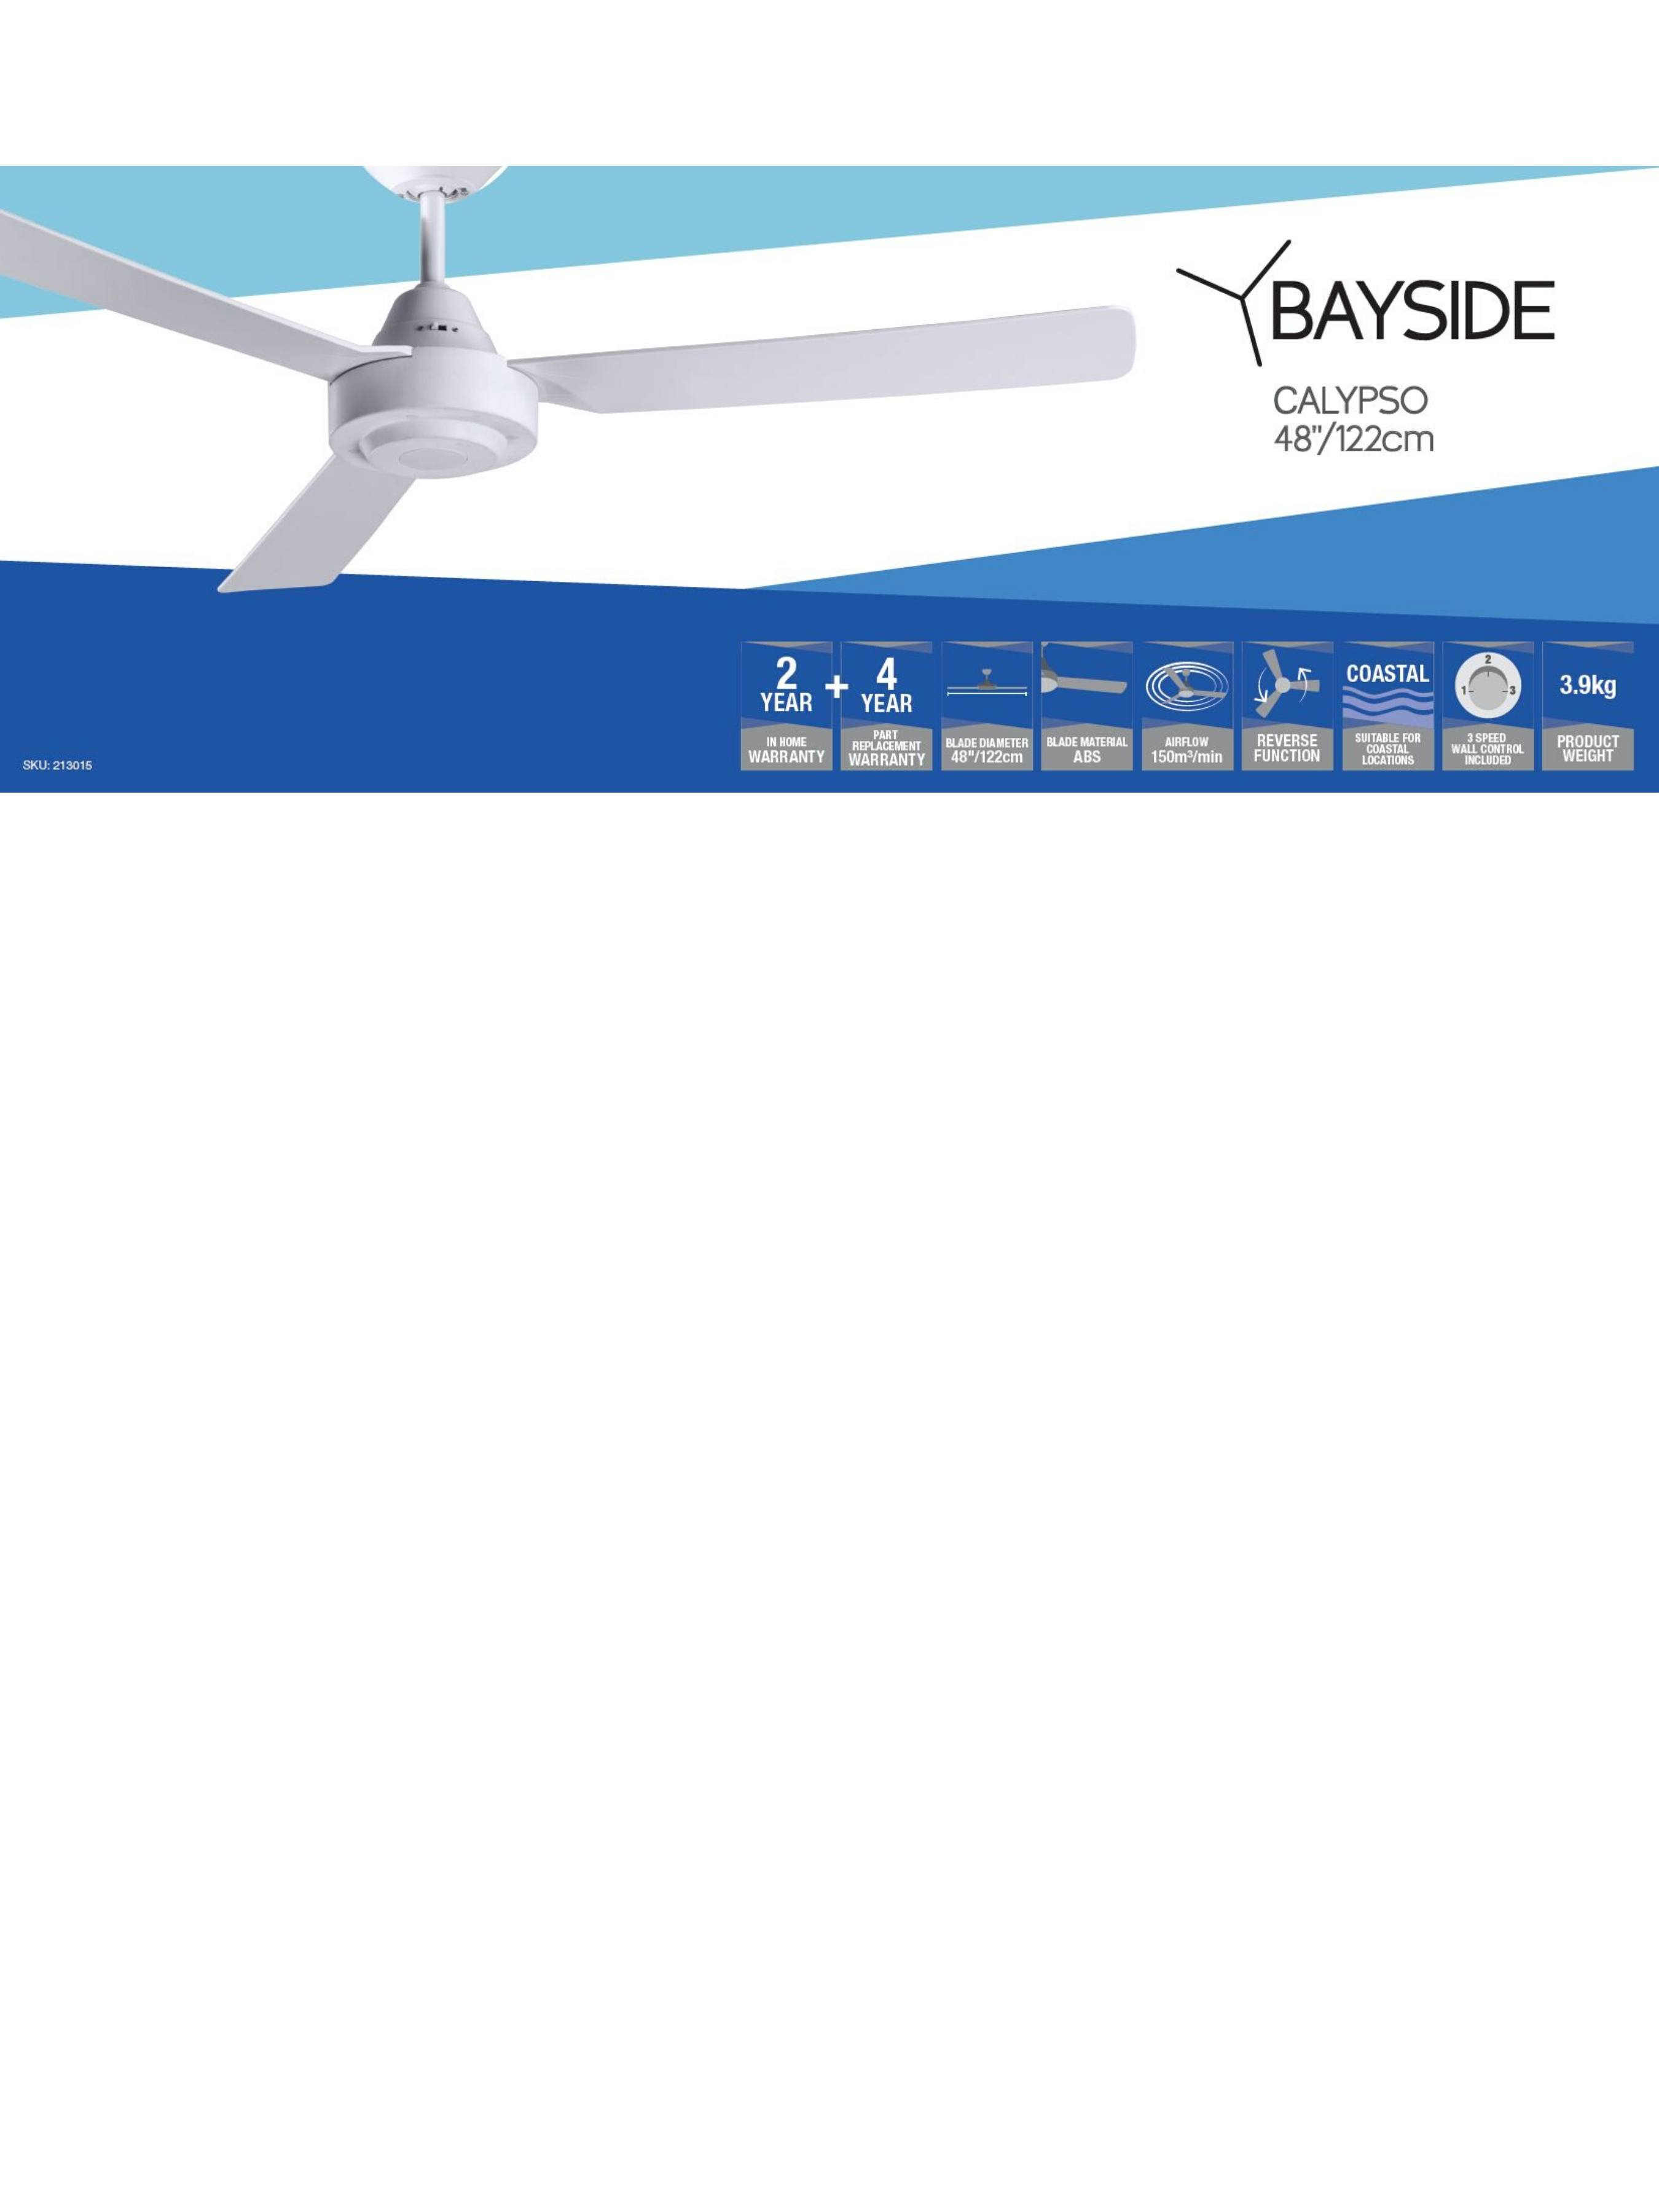 Bayside Calypso Deckenventilator - Beacon Lighting Europe